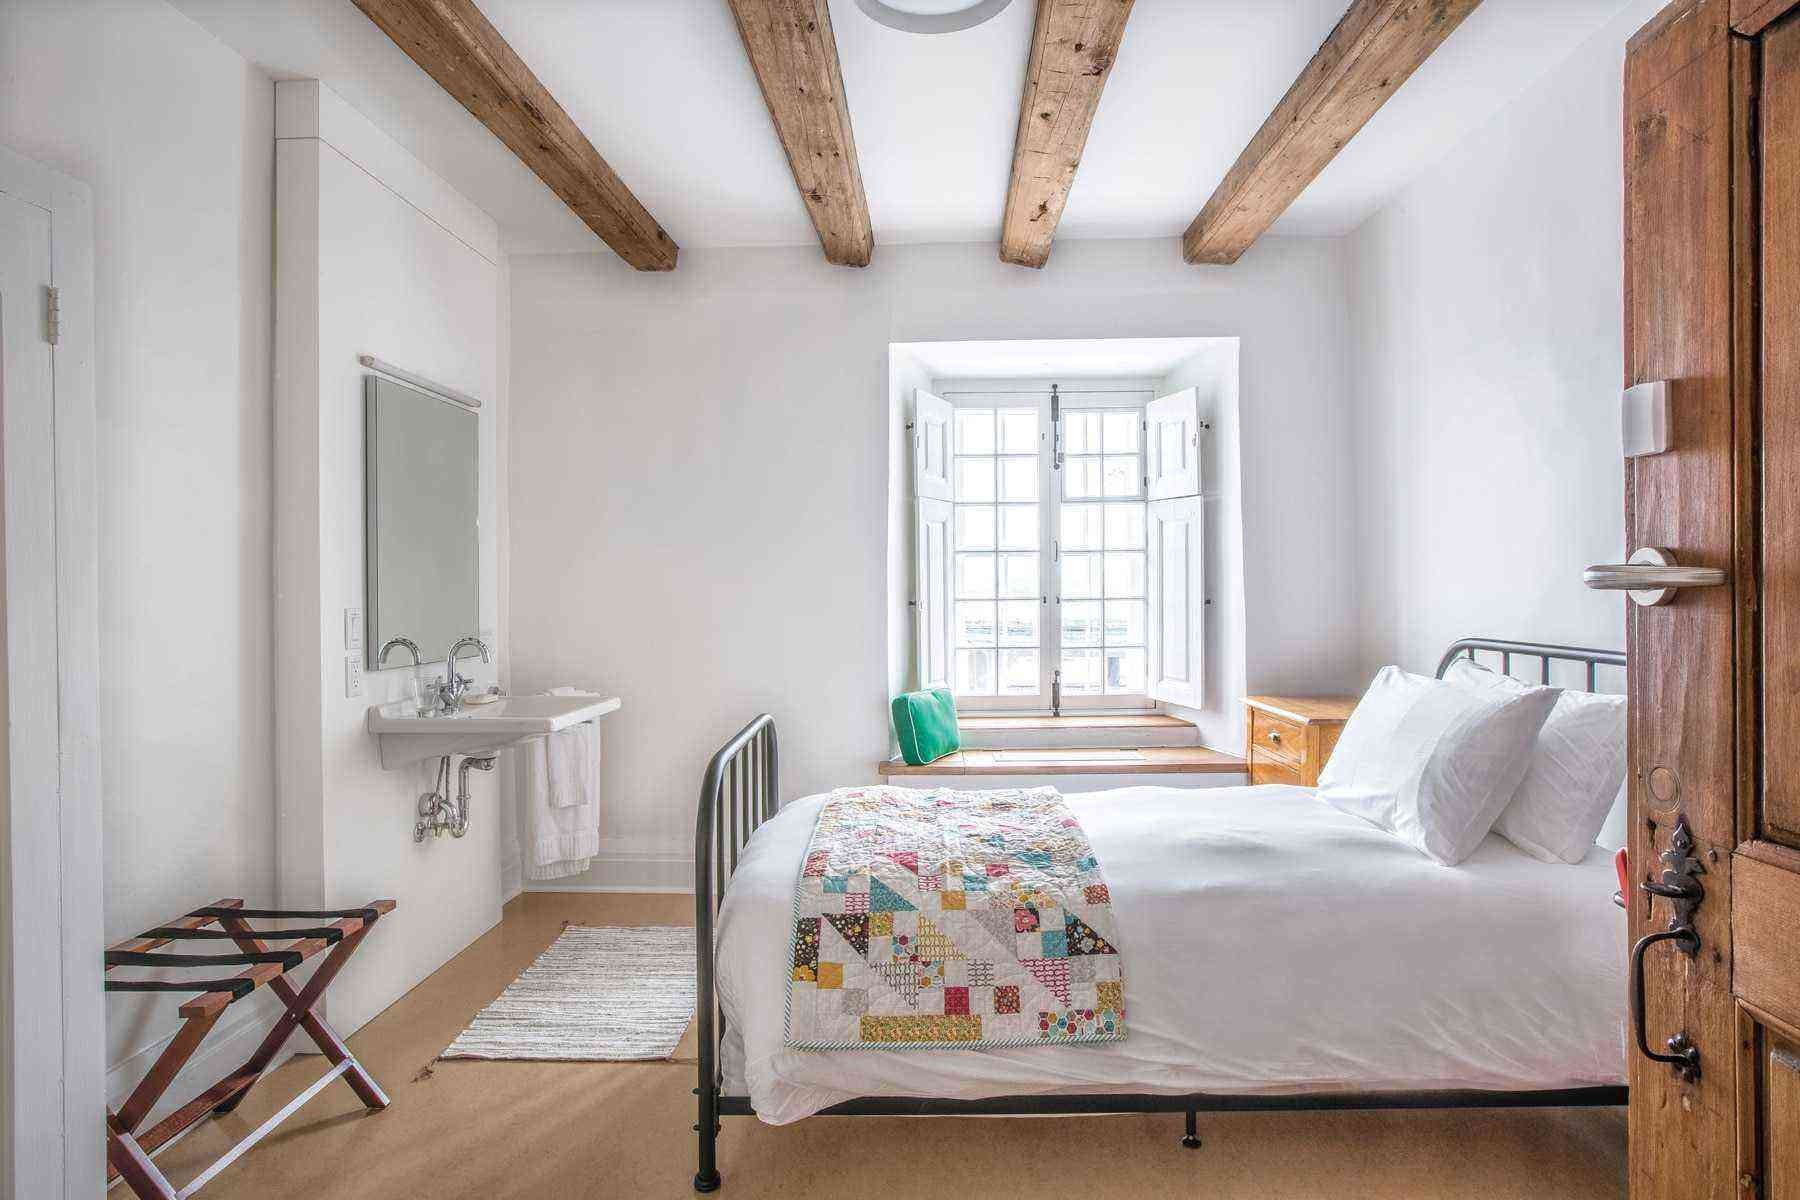 Bedroom-Le Monastere des Augustines